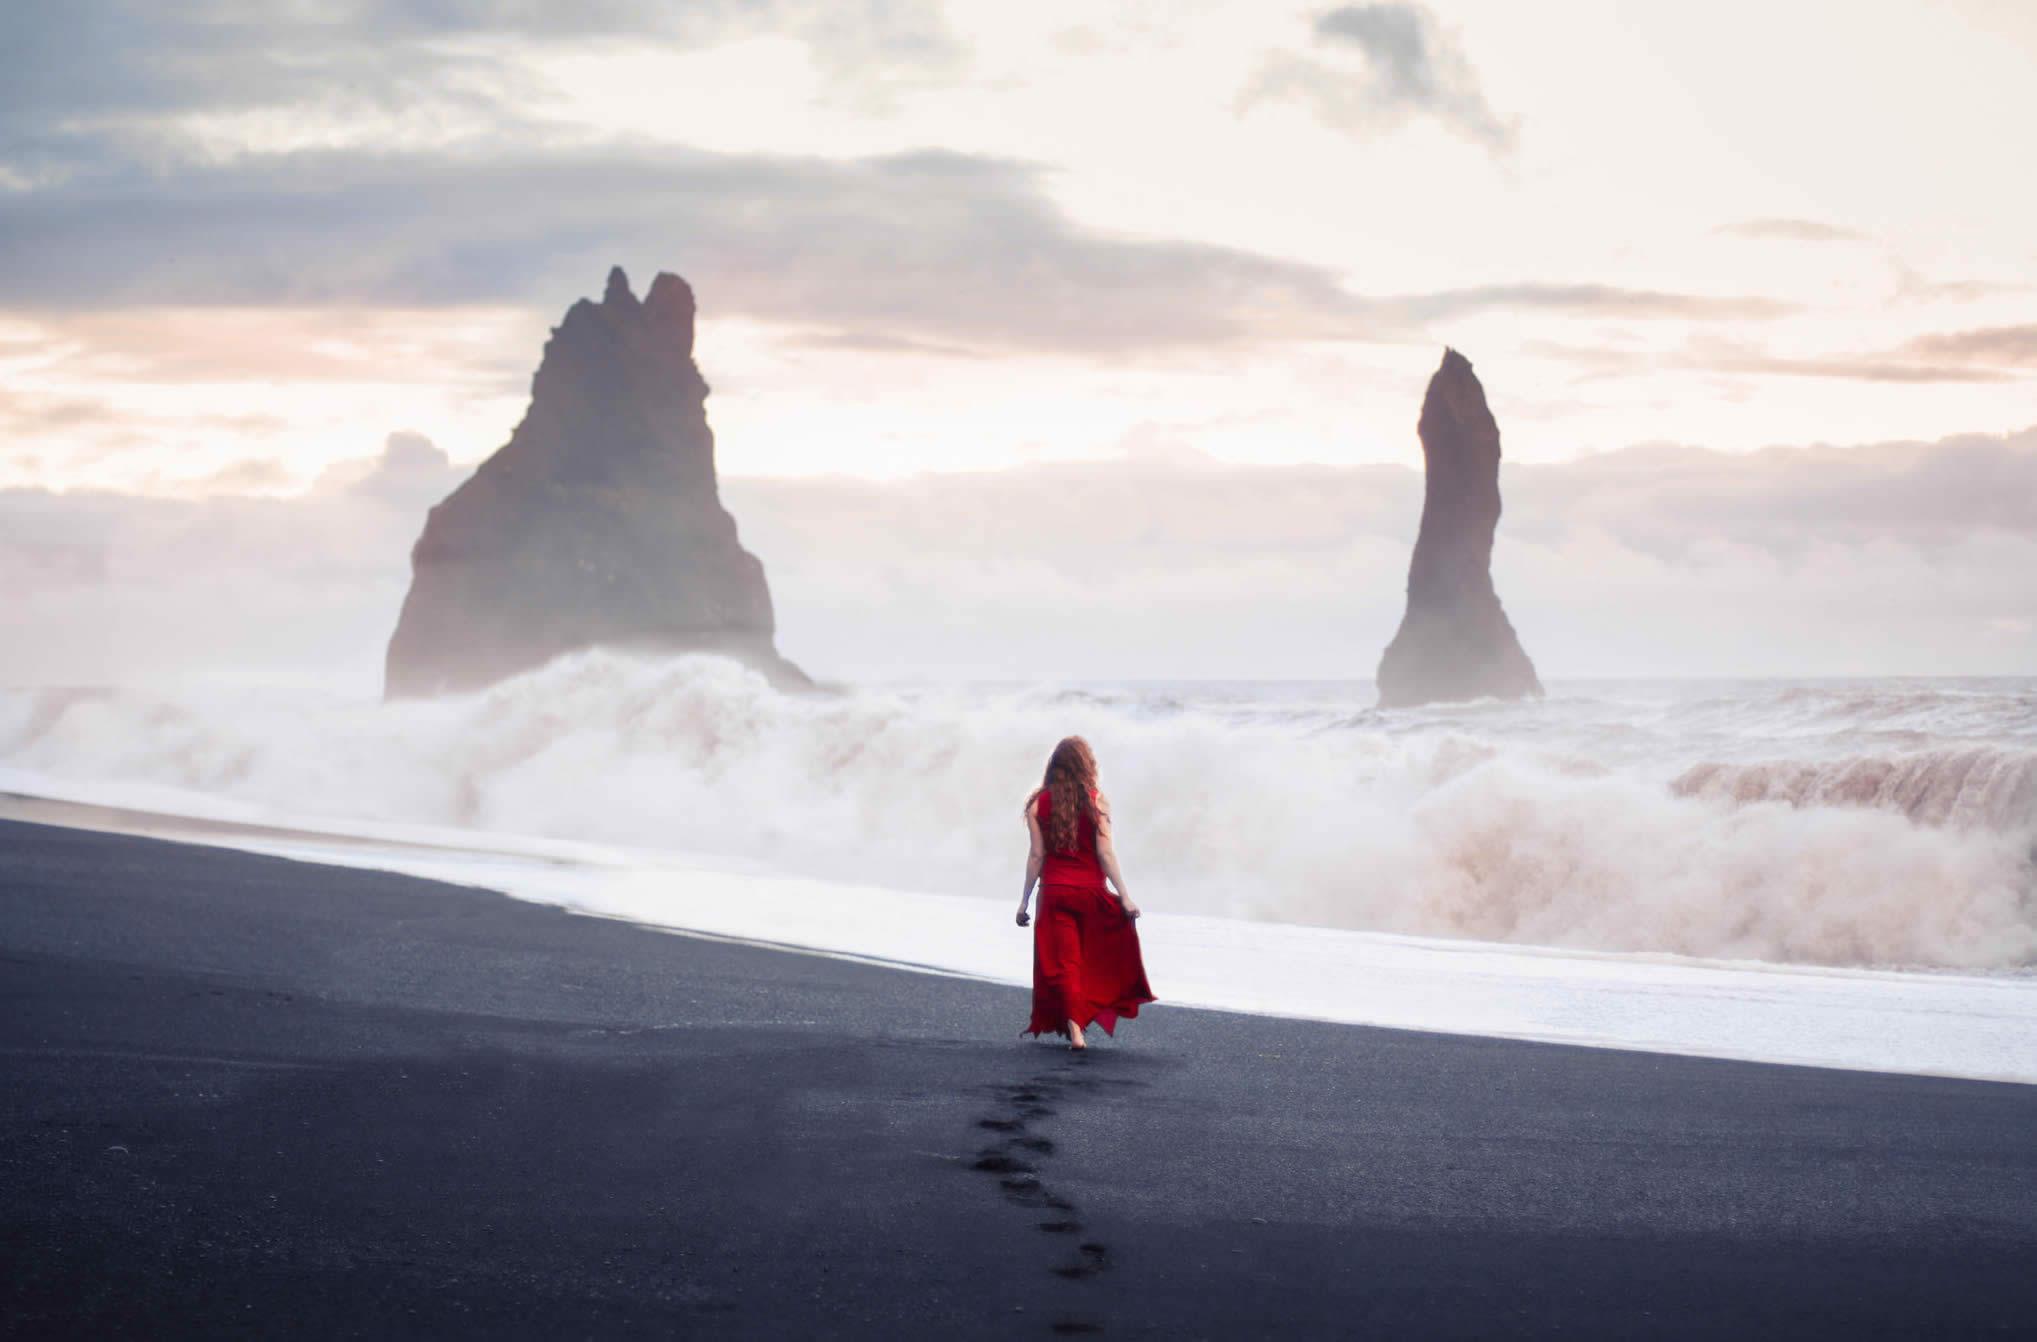 lizzy gadd photography landscape breathtaking scope beach